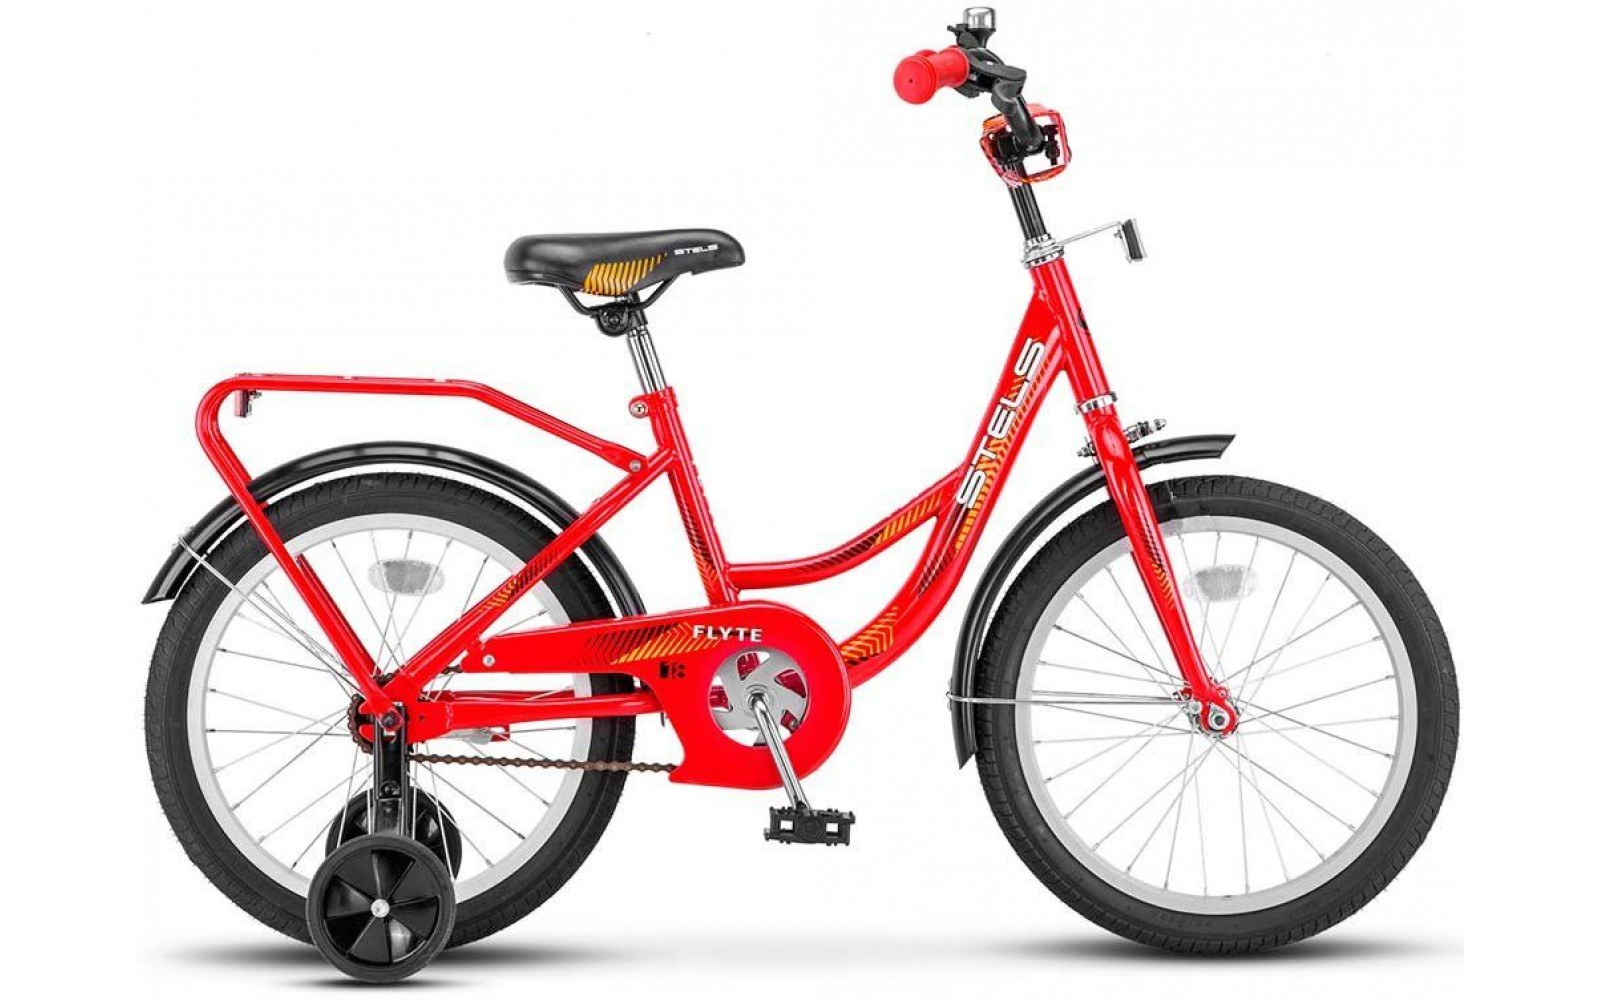 Детский велосипед Stels Flyte 16 2018